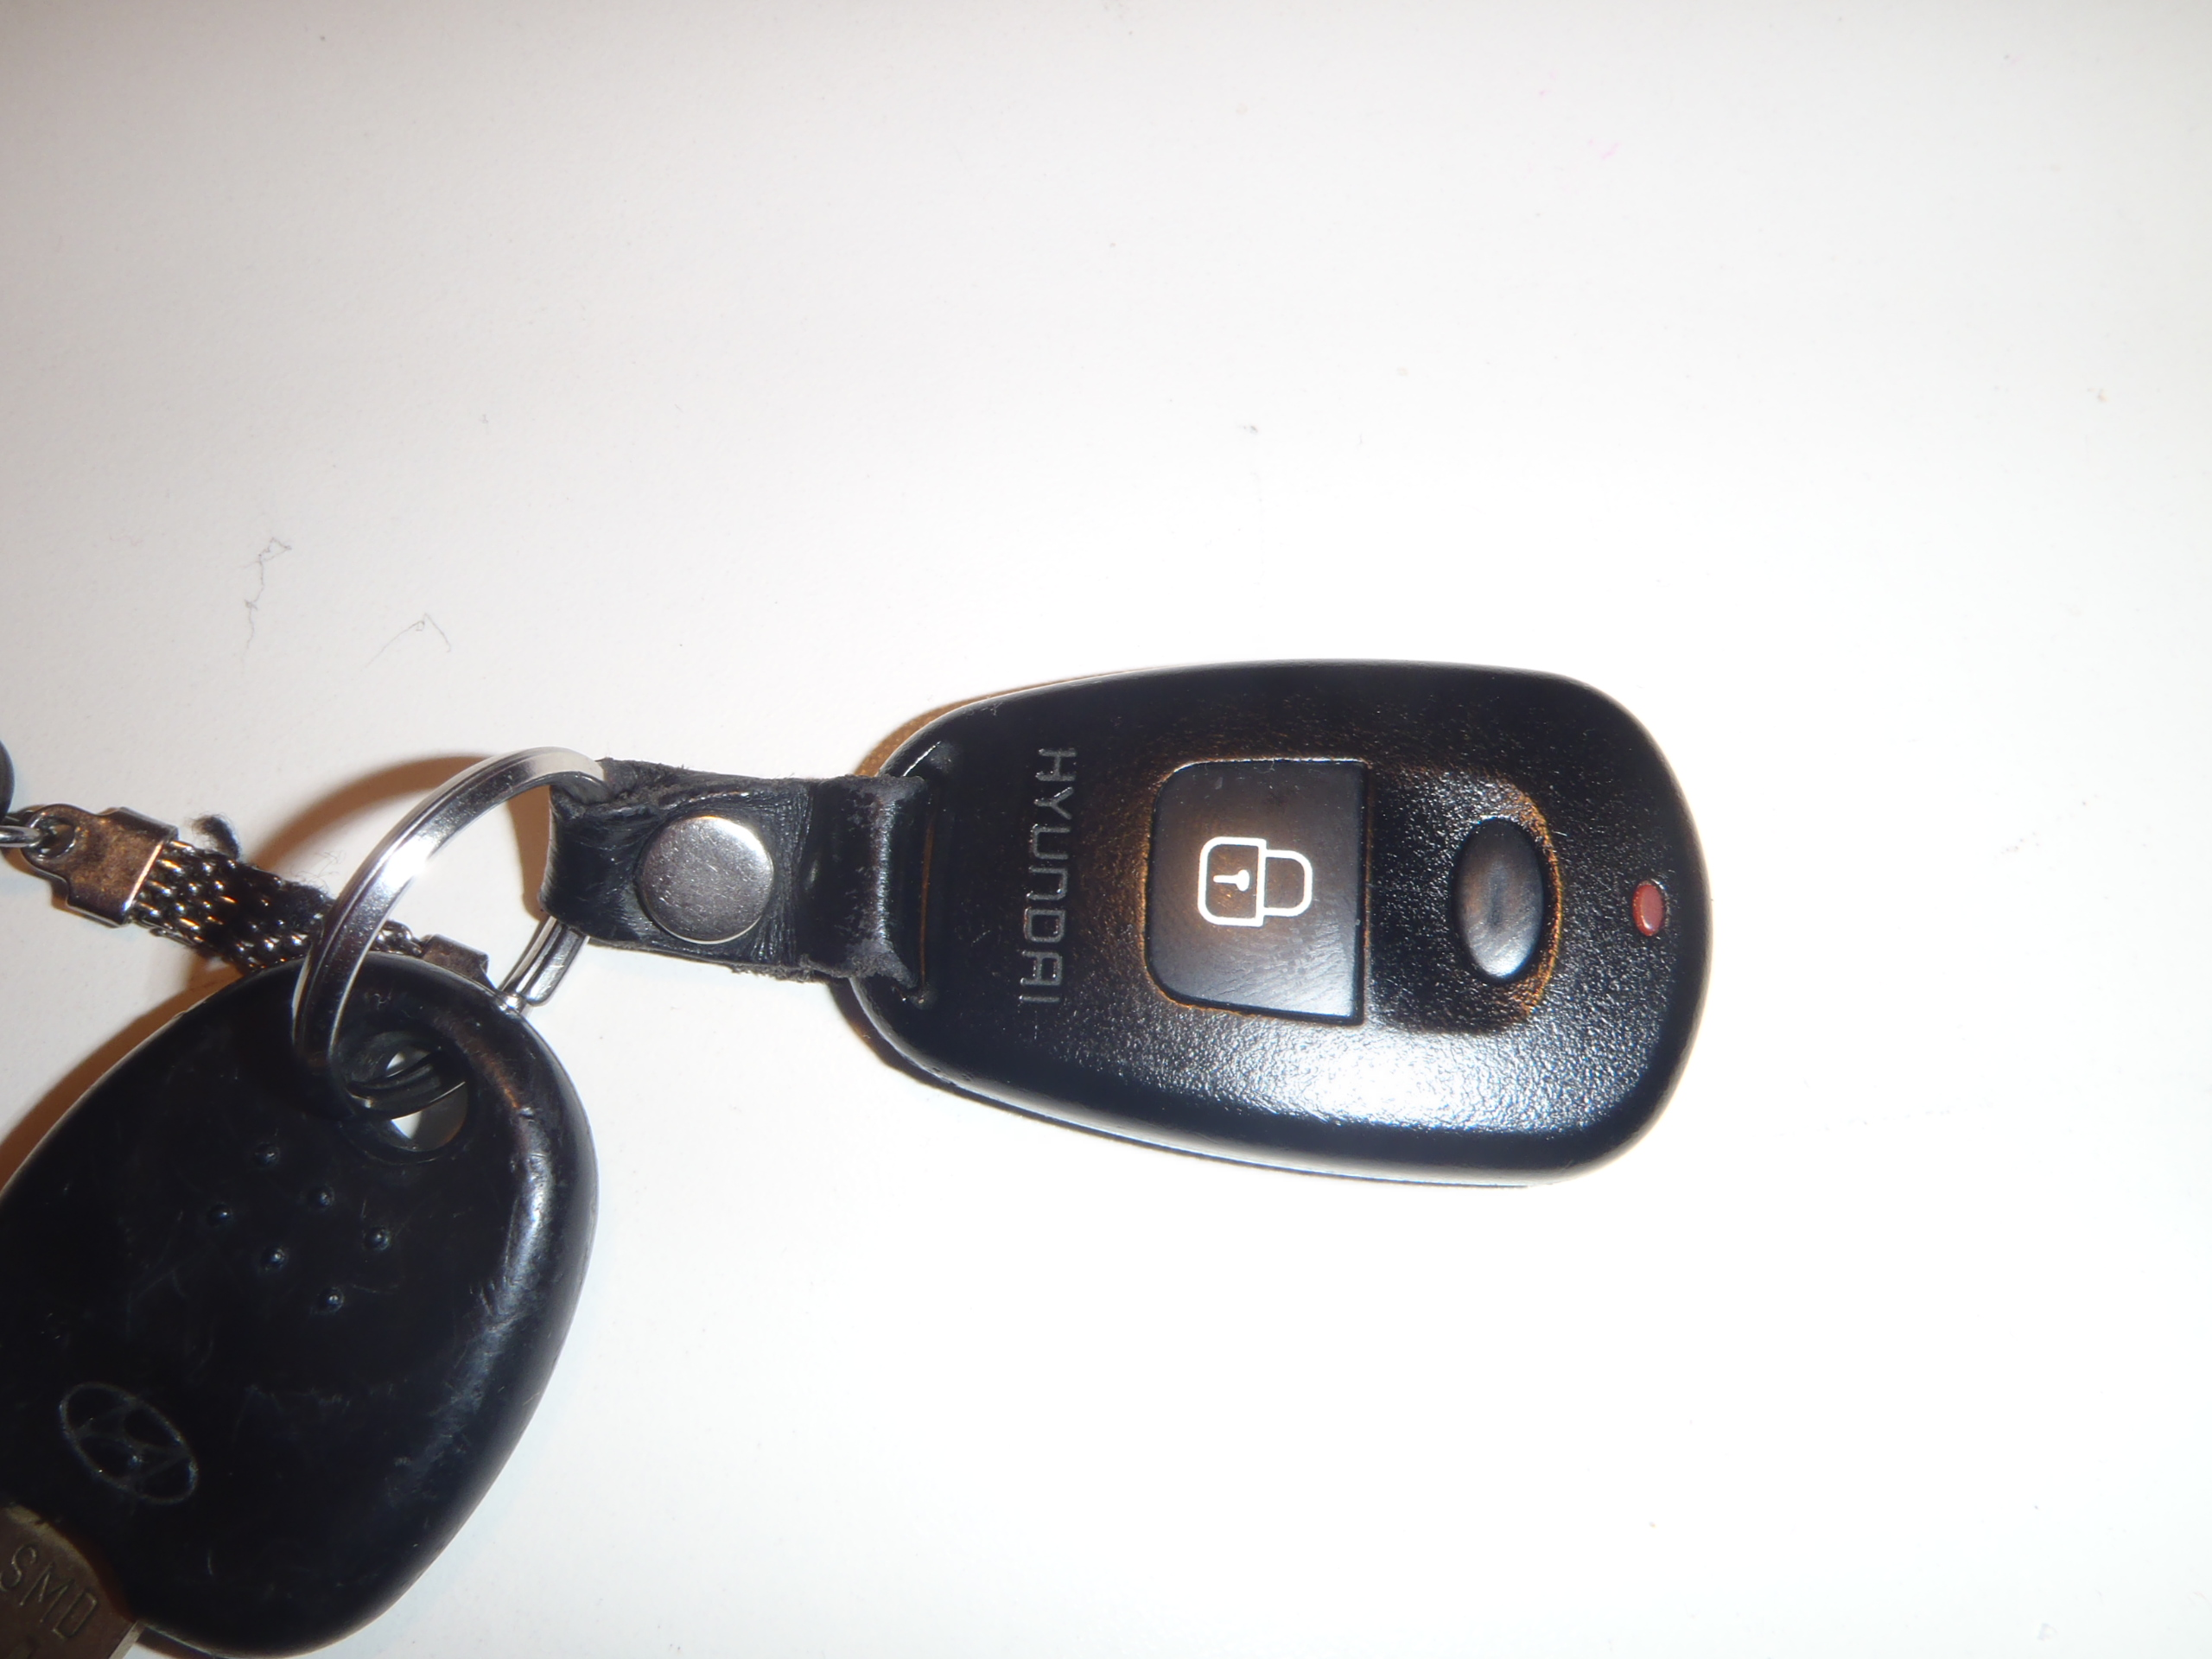 Hyundai Santa Fe 2001 - jaka cz�stotliwo�� pilota centralnego zamka